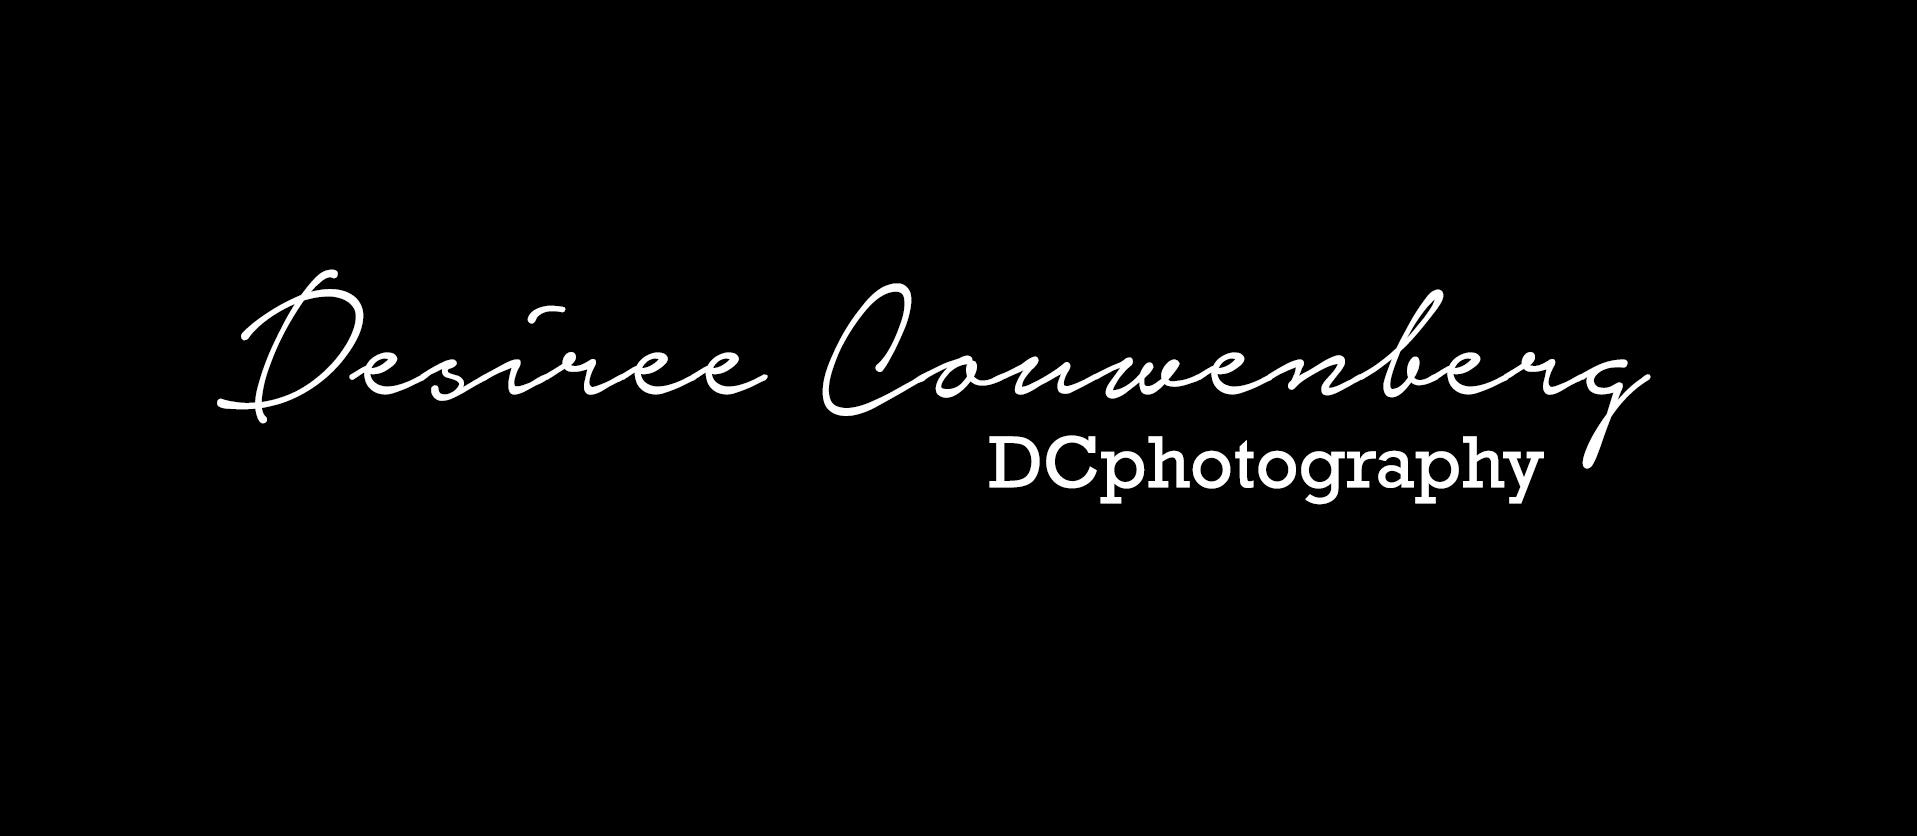 Desirée Couwenberg